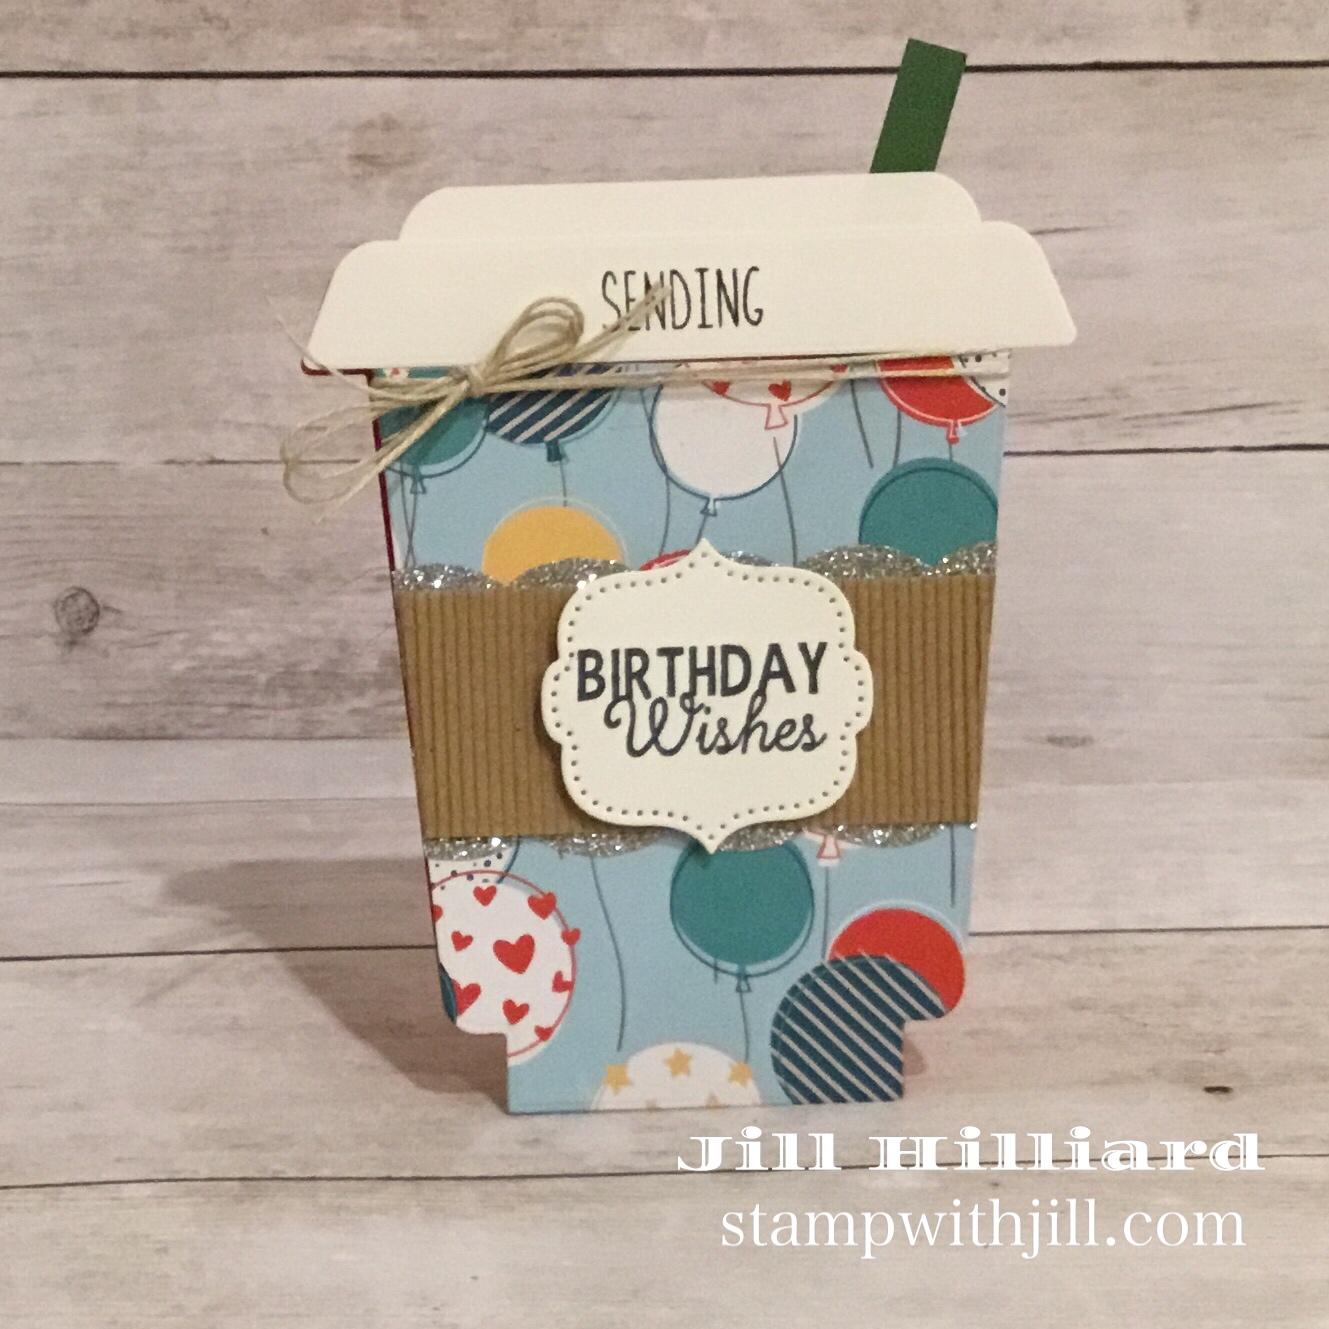 Stamp with Jill, Honeybee Stamps Frappe Shake Die coffee birthday cards